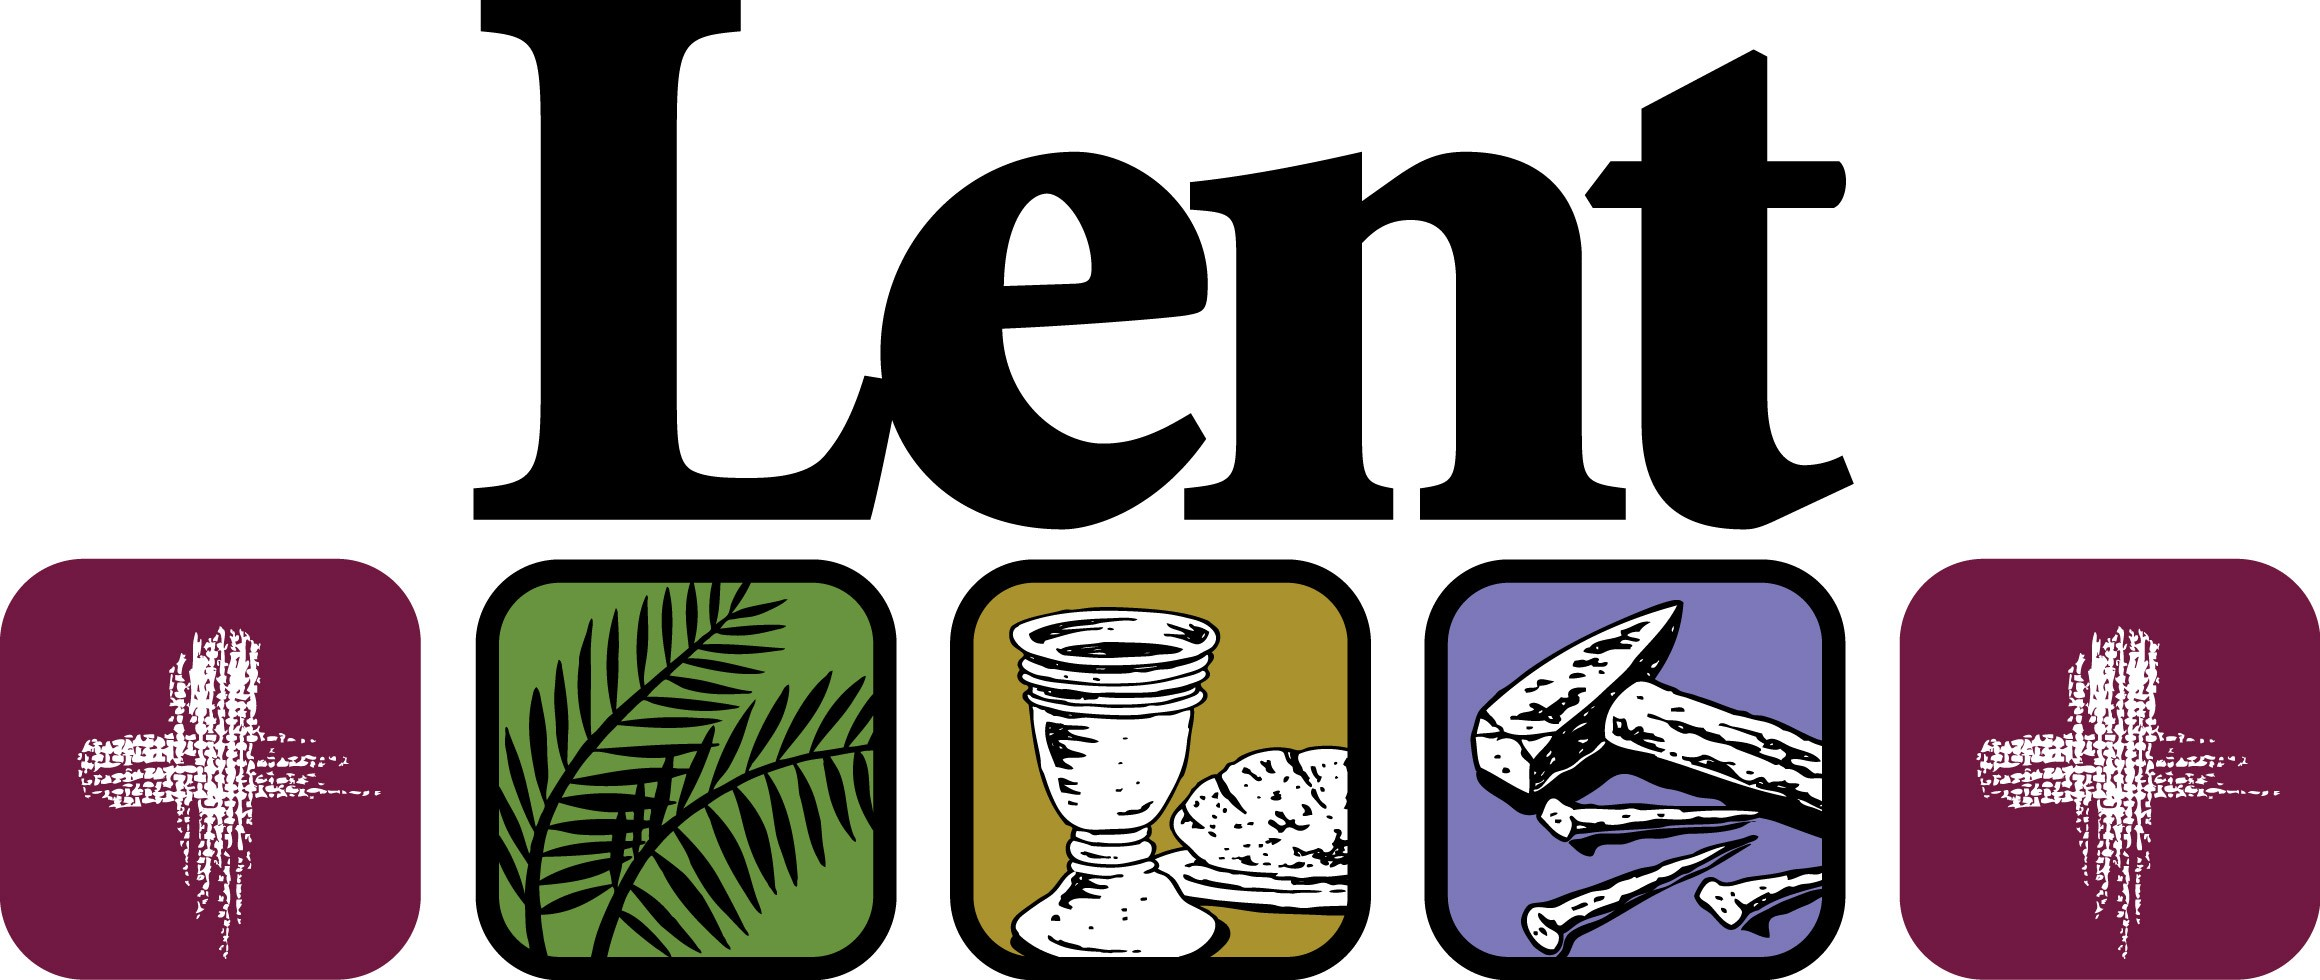 2320x980 Lenten Abstinence Archdiocese Of Cincinnati